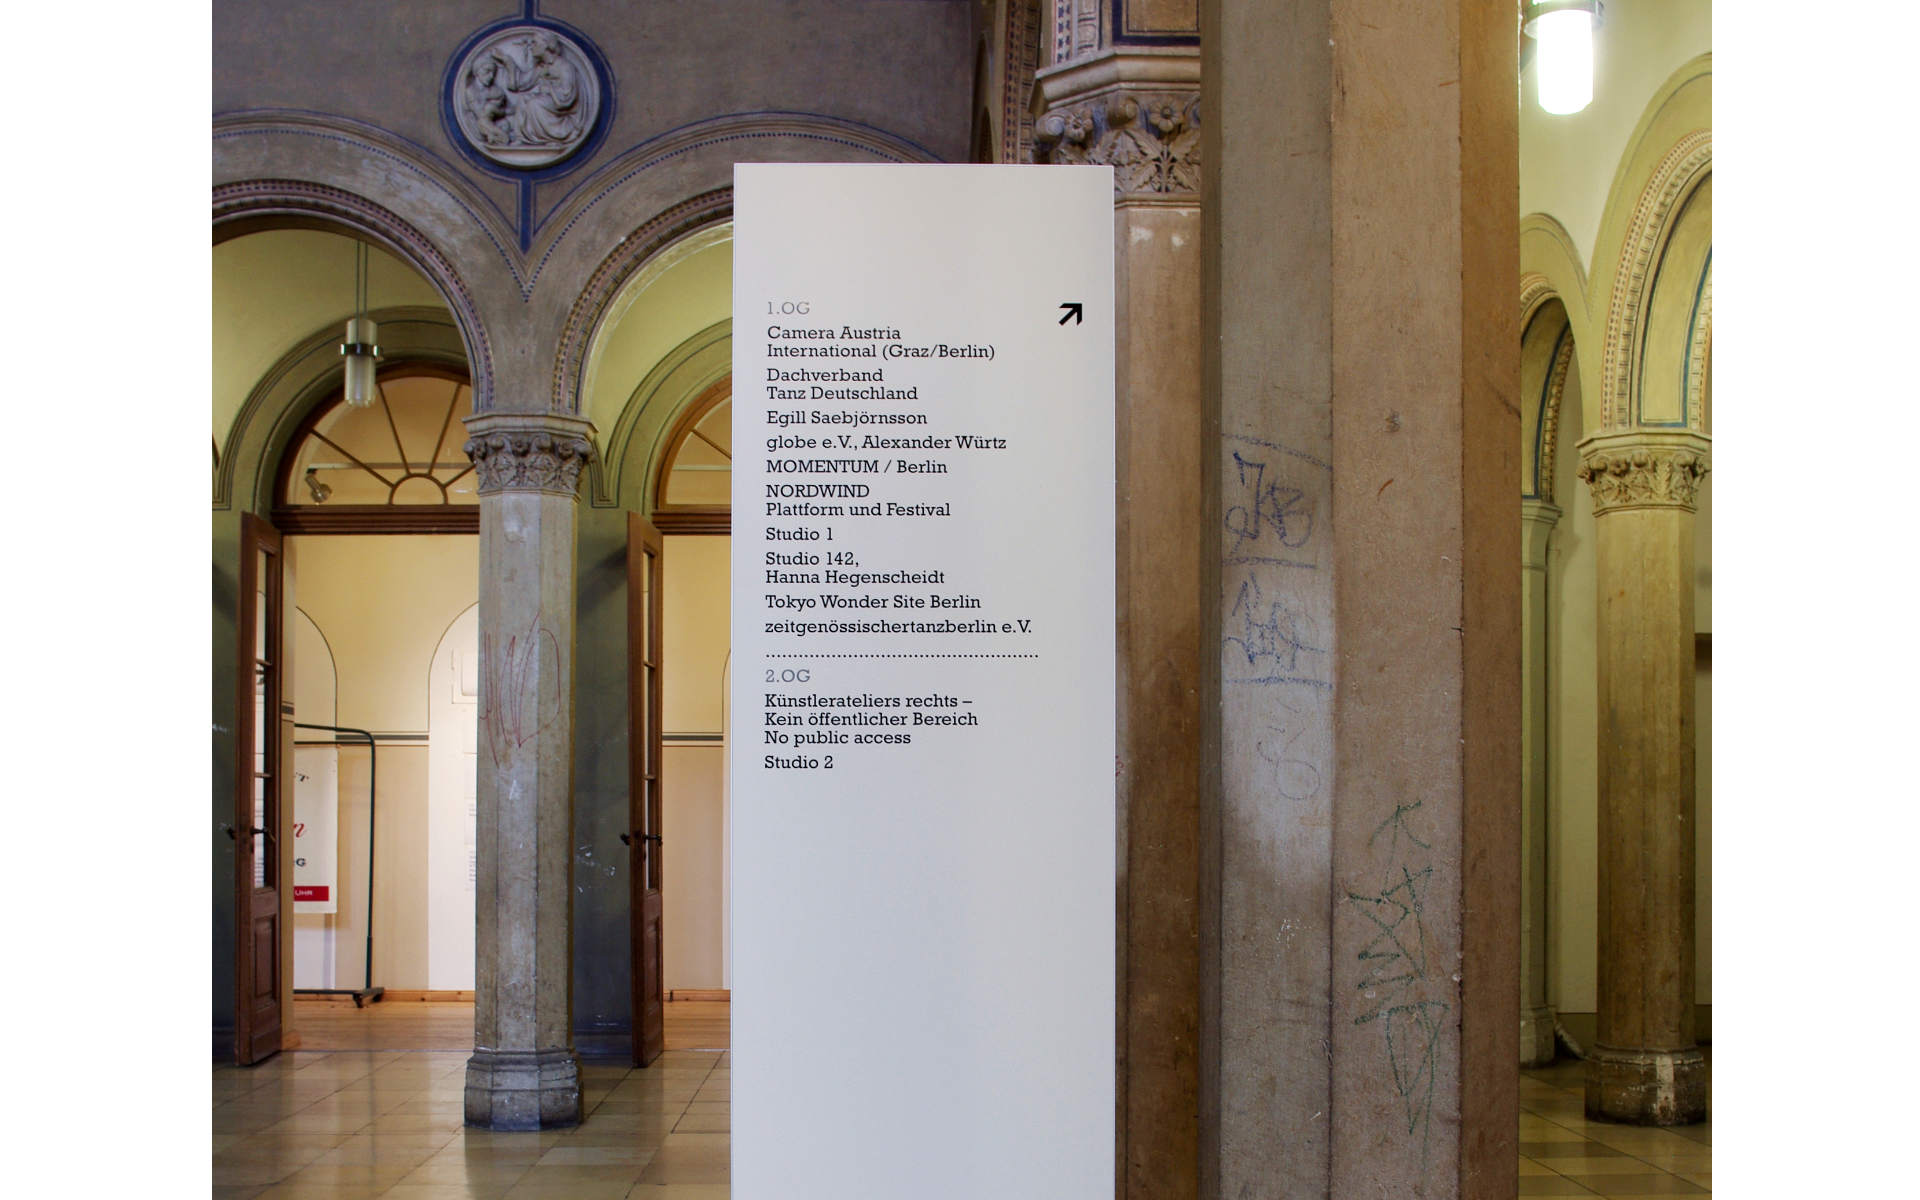 Kunstquartier Bethanien Informationssystem Stele